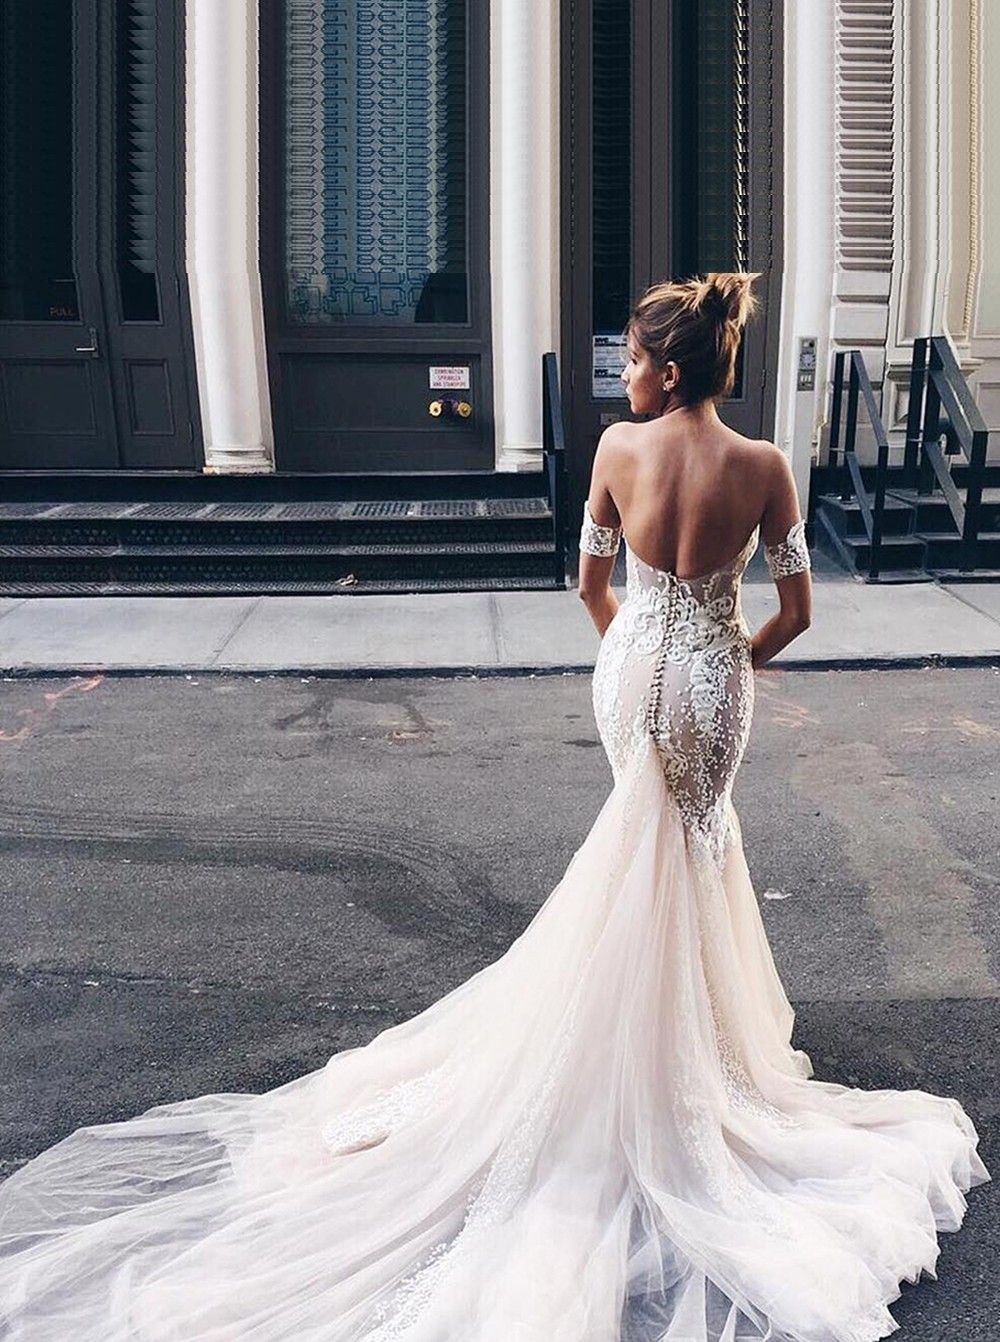 Stylish Sweetheart Watteau Train Mermaid Wedding Dress with White